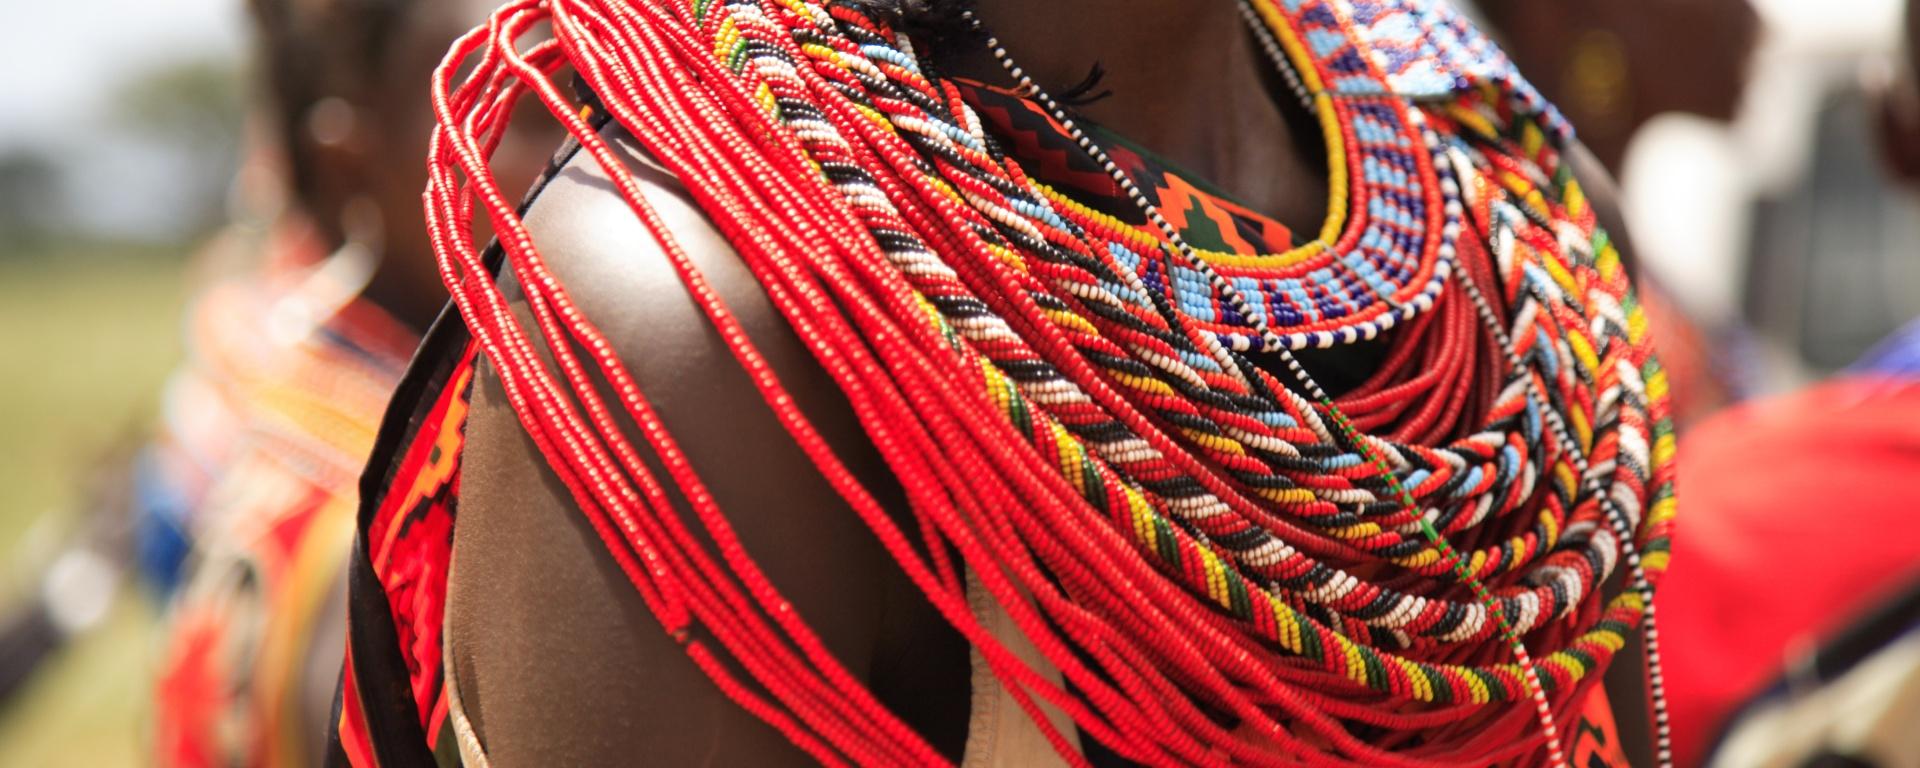 African Culture, African jewellery